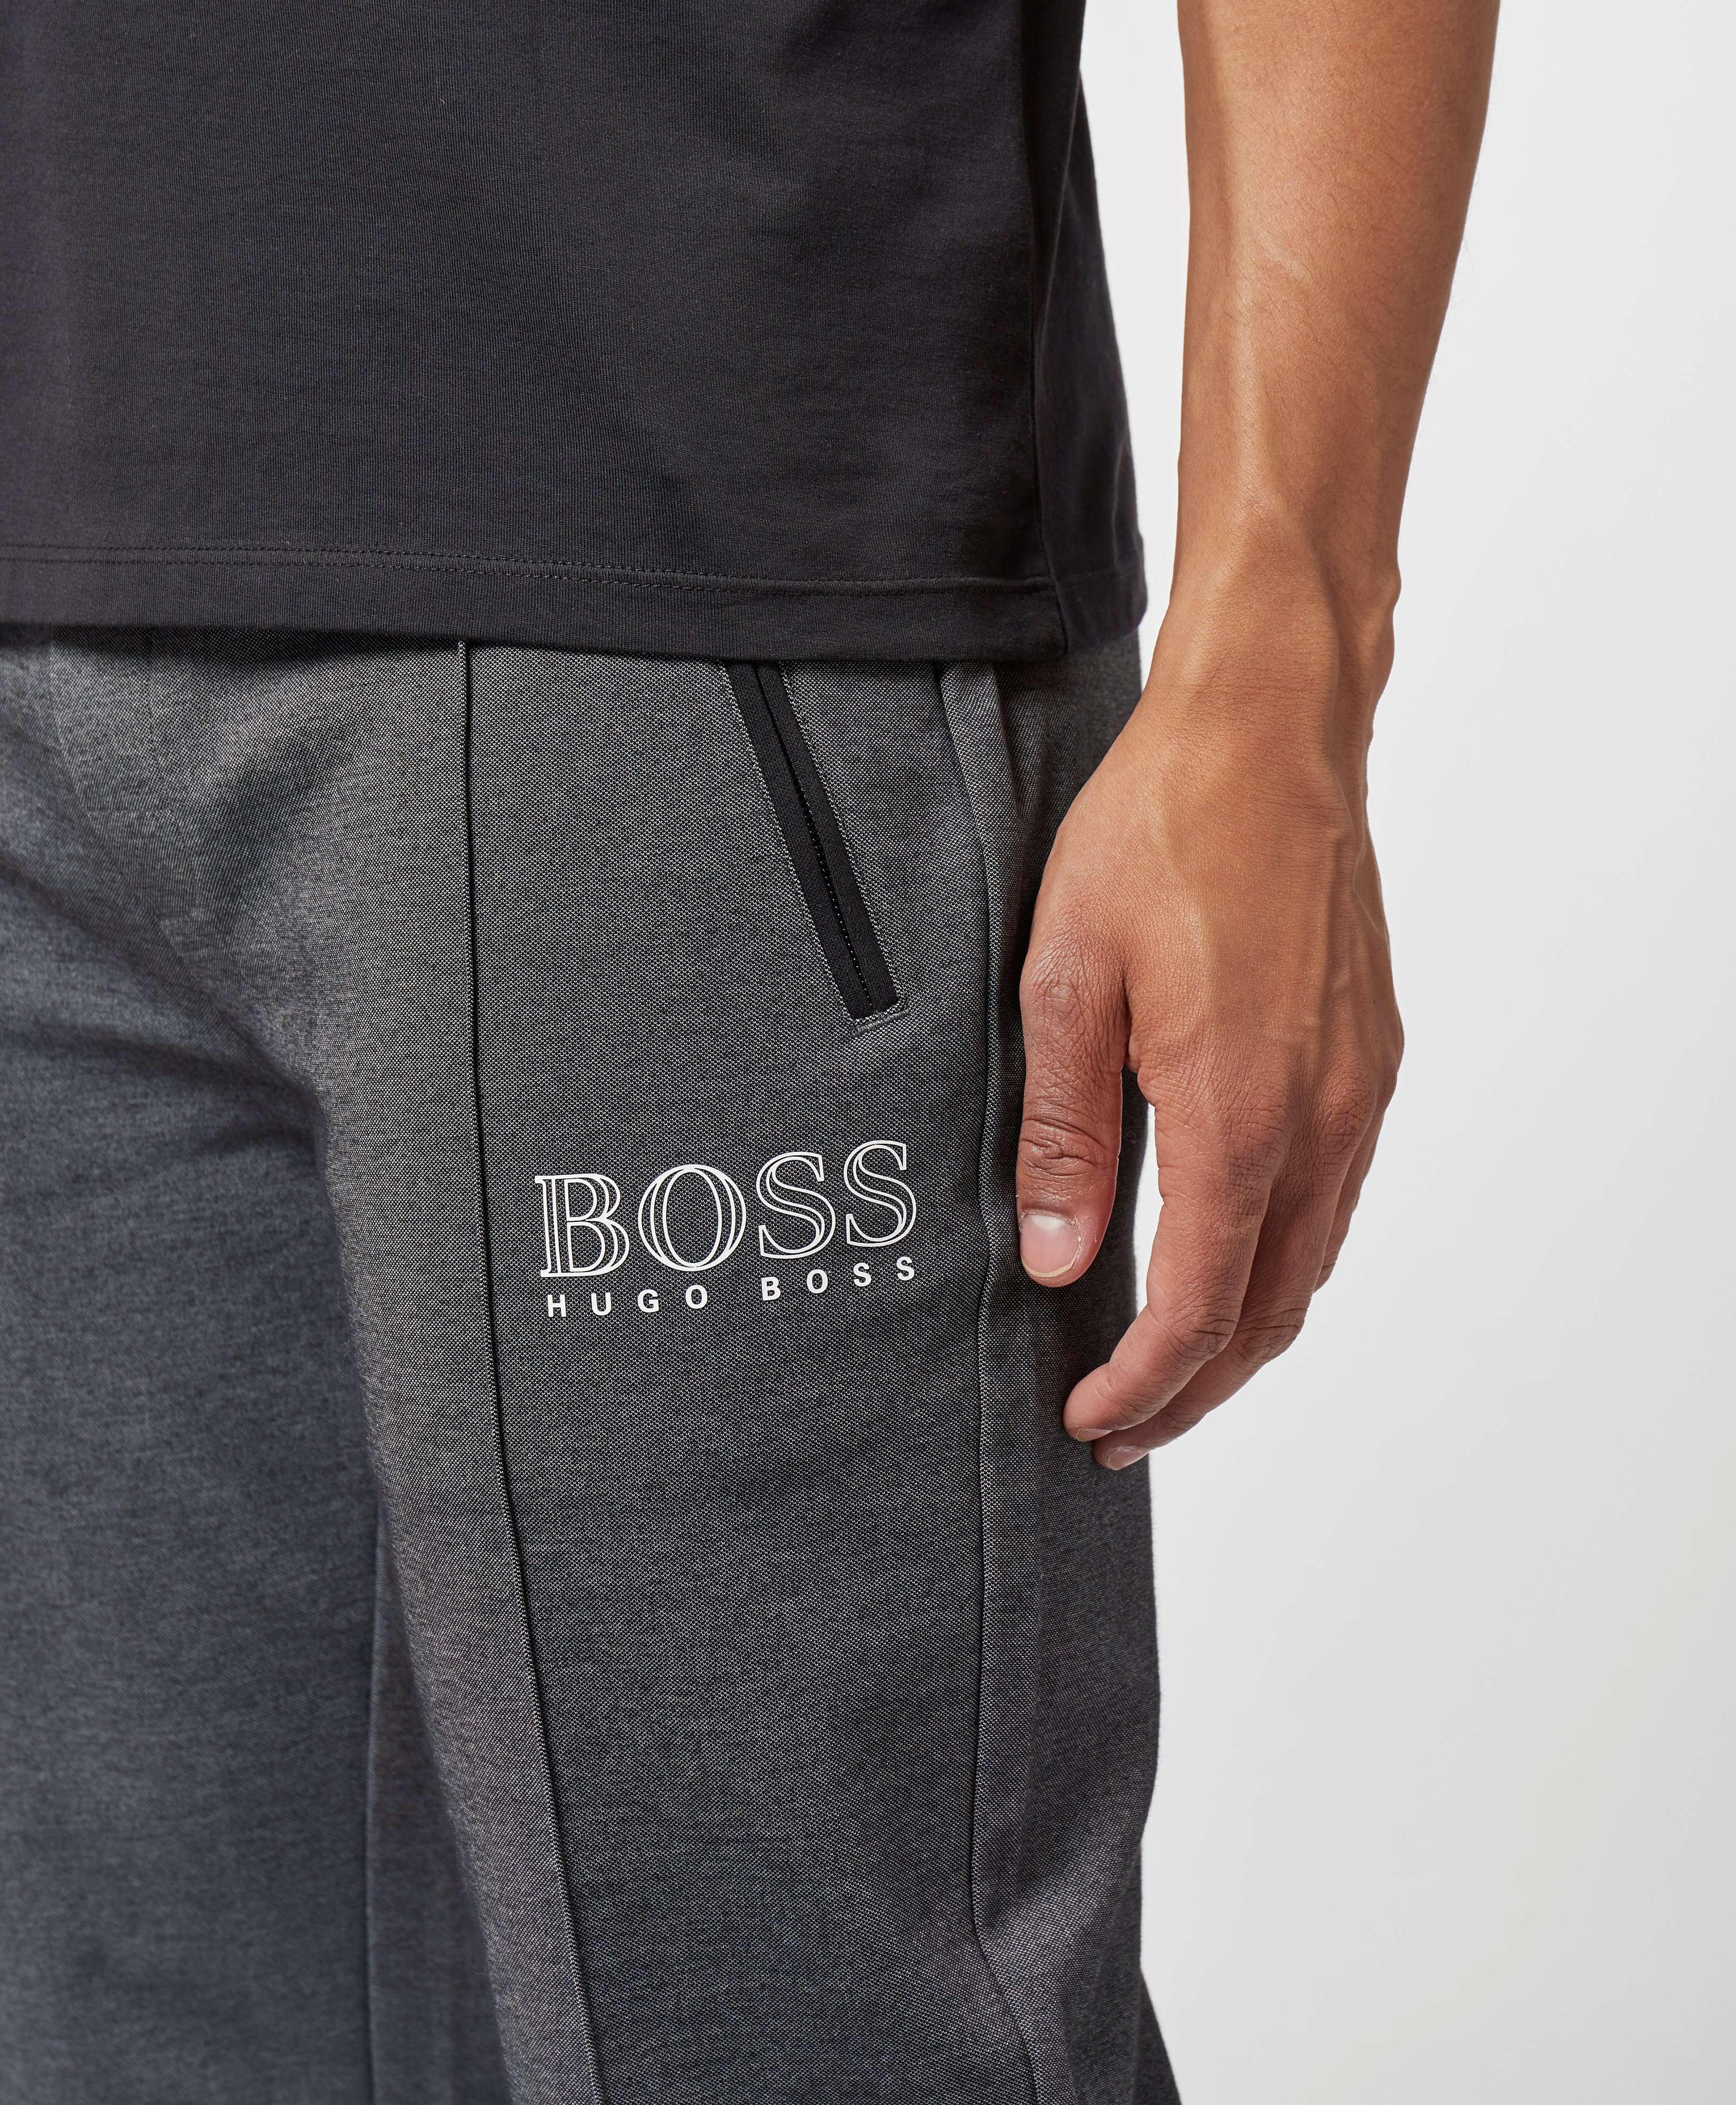 BOSS Poly Pique Cuffed Fleece Pants - Exclusive